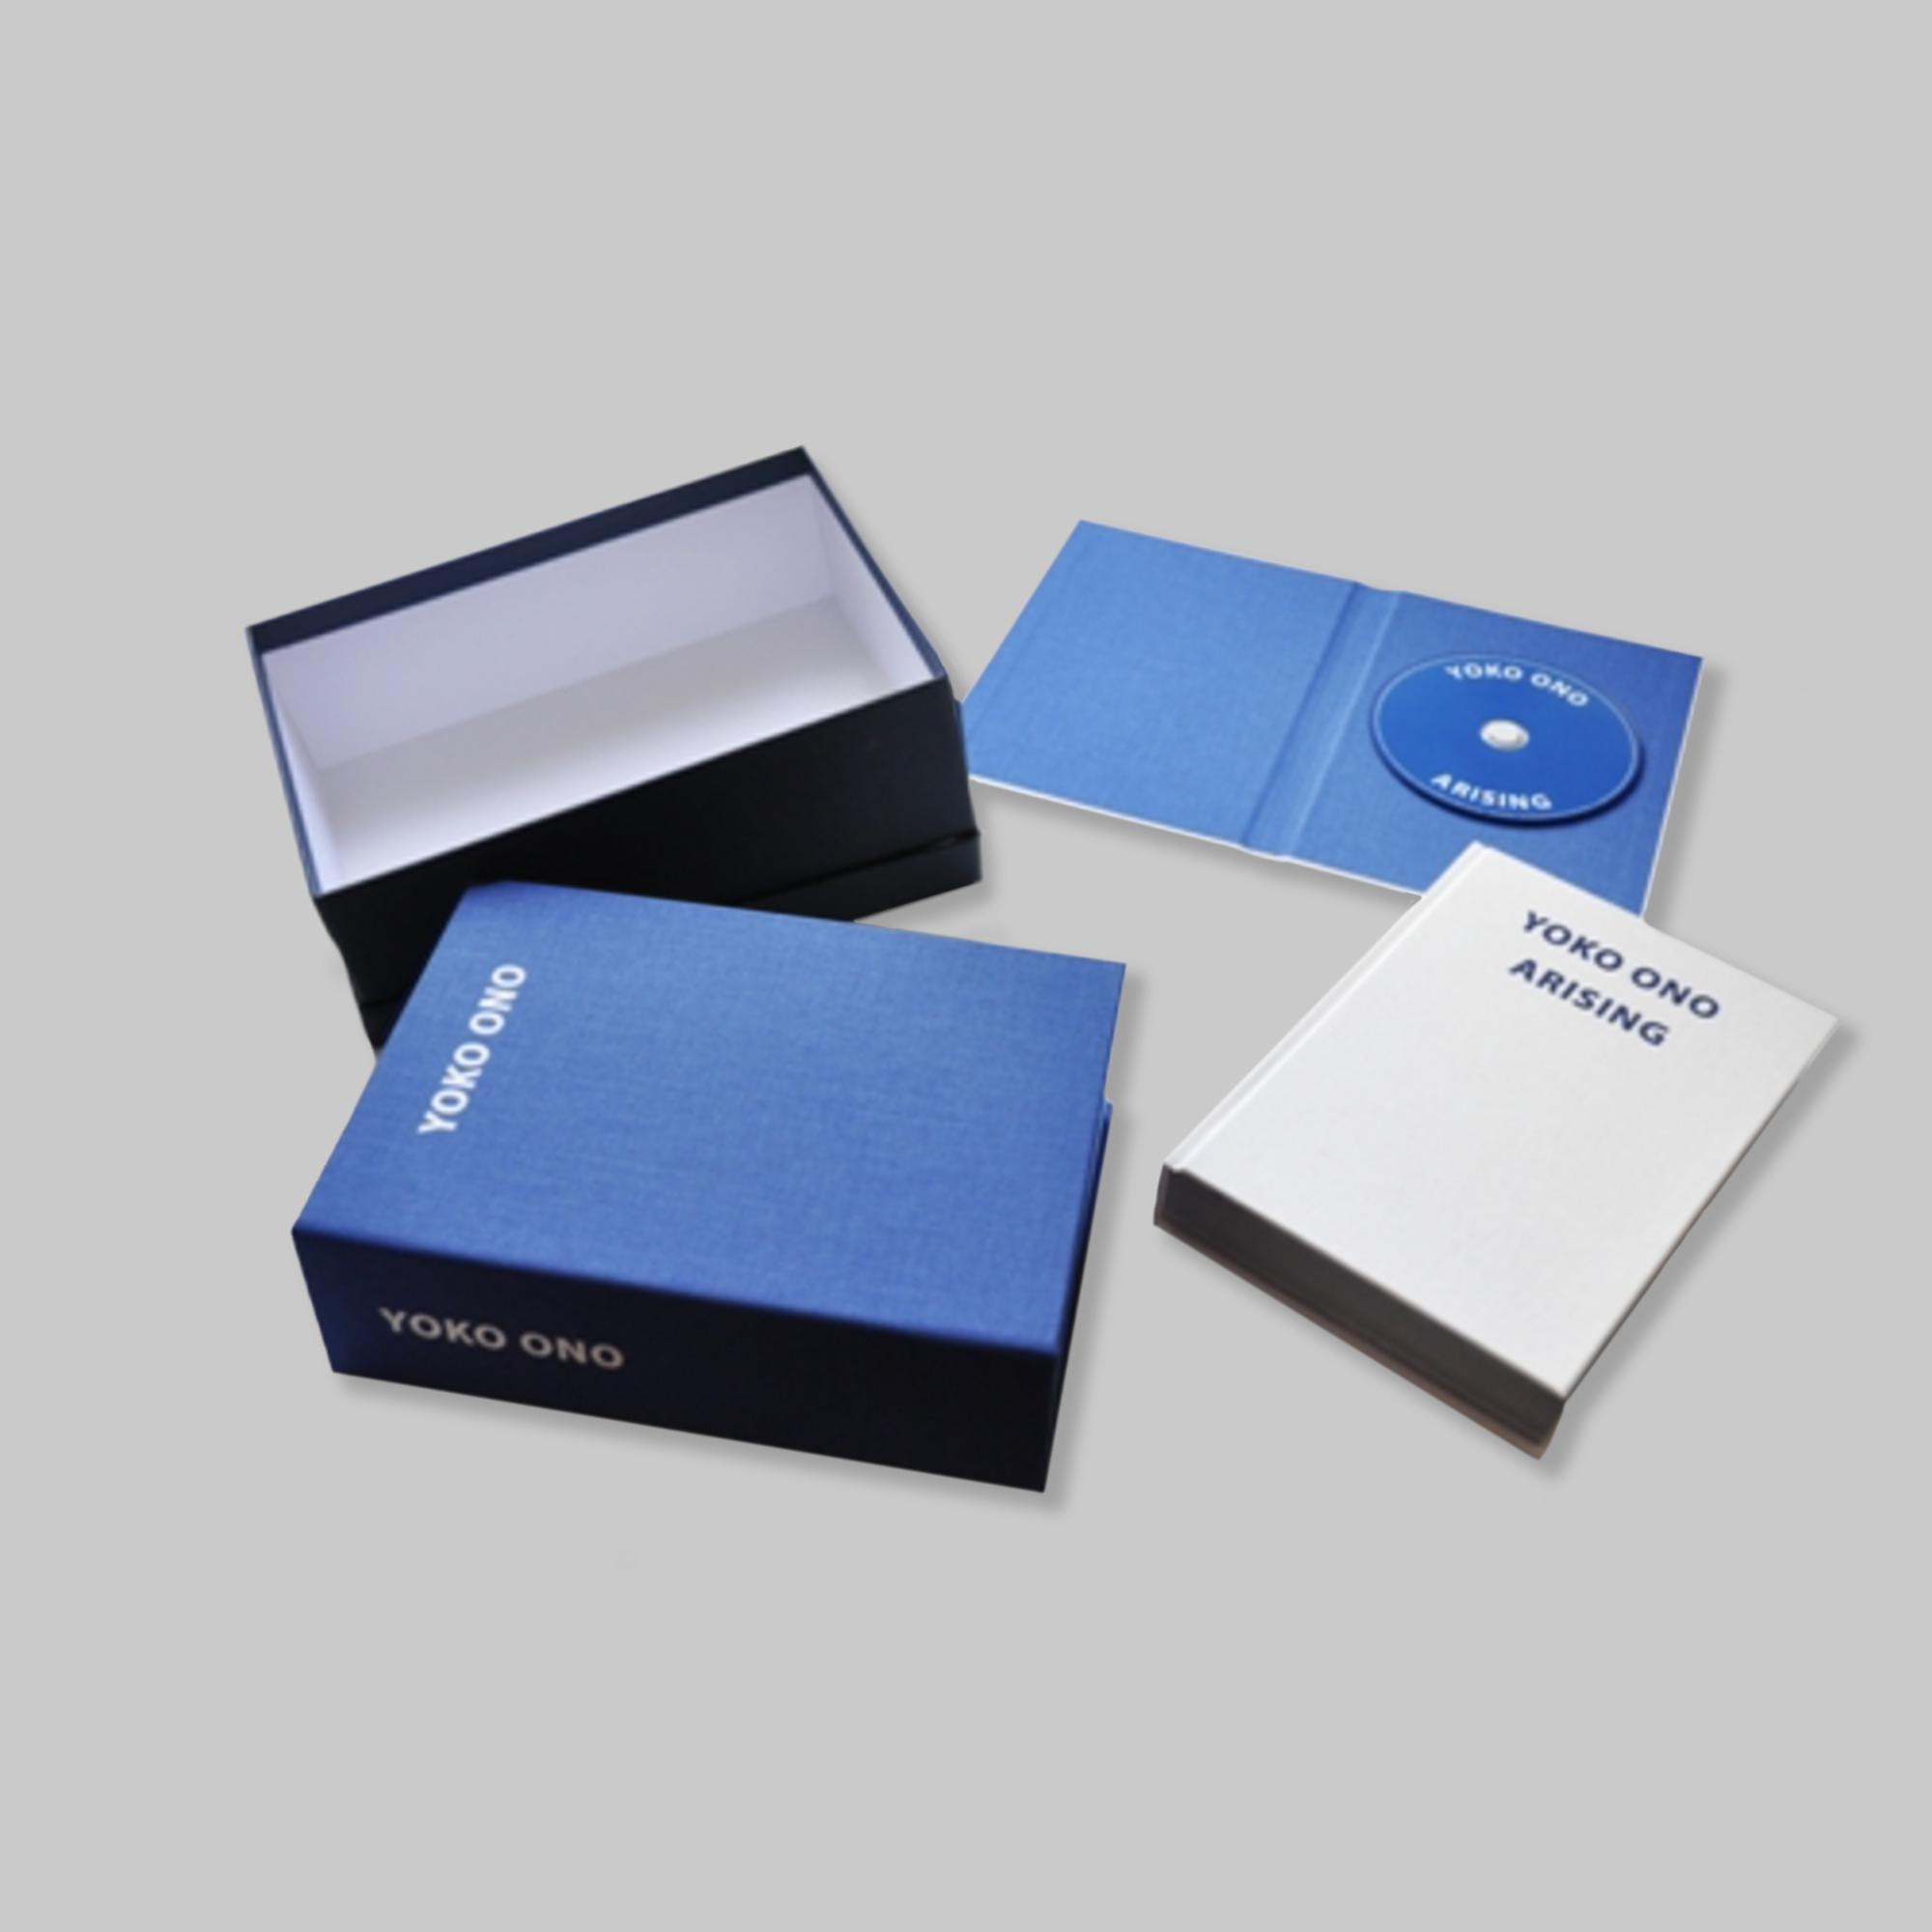 YOKO-ONO-ARISING-Standard-edition-of-150-copies-